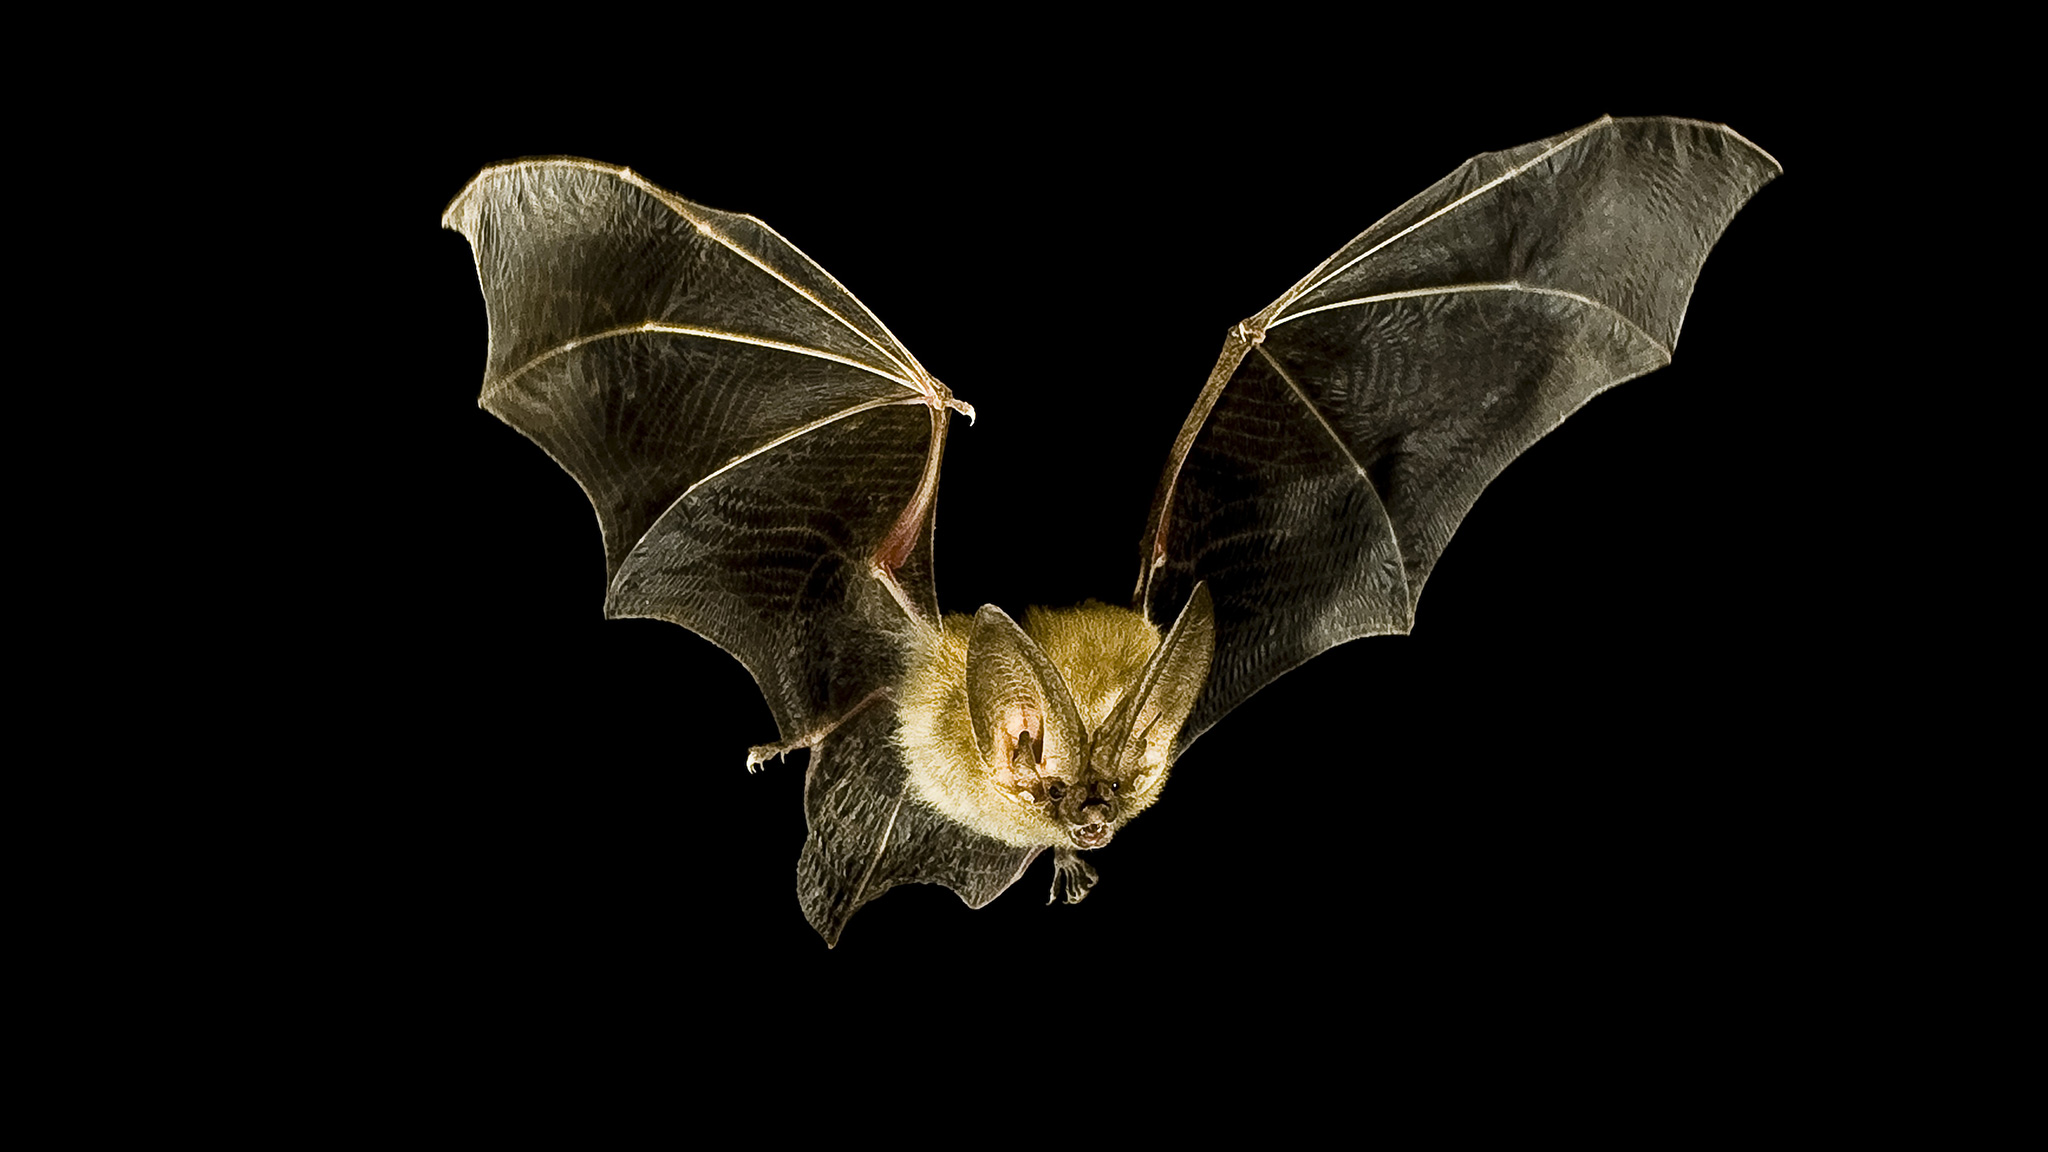 bat-flying